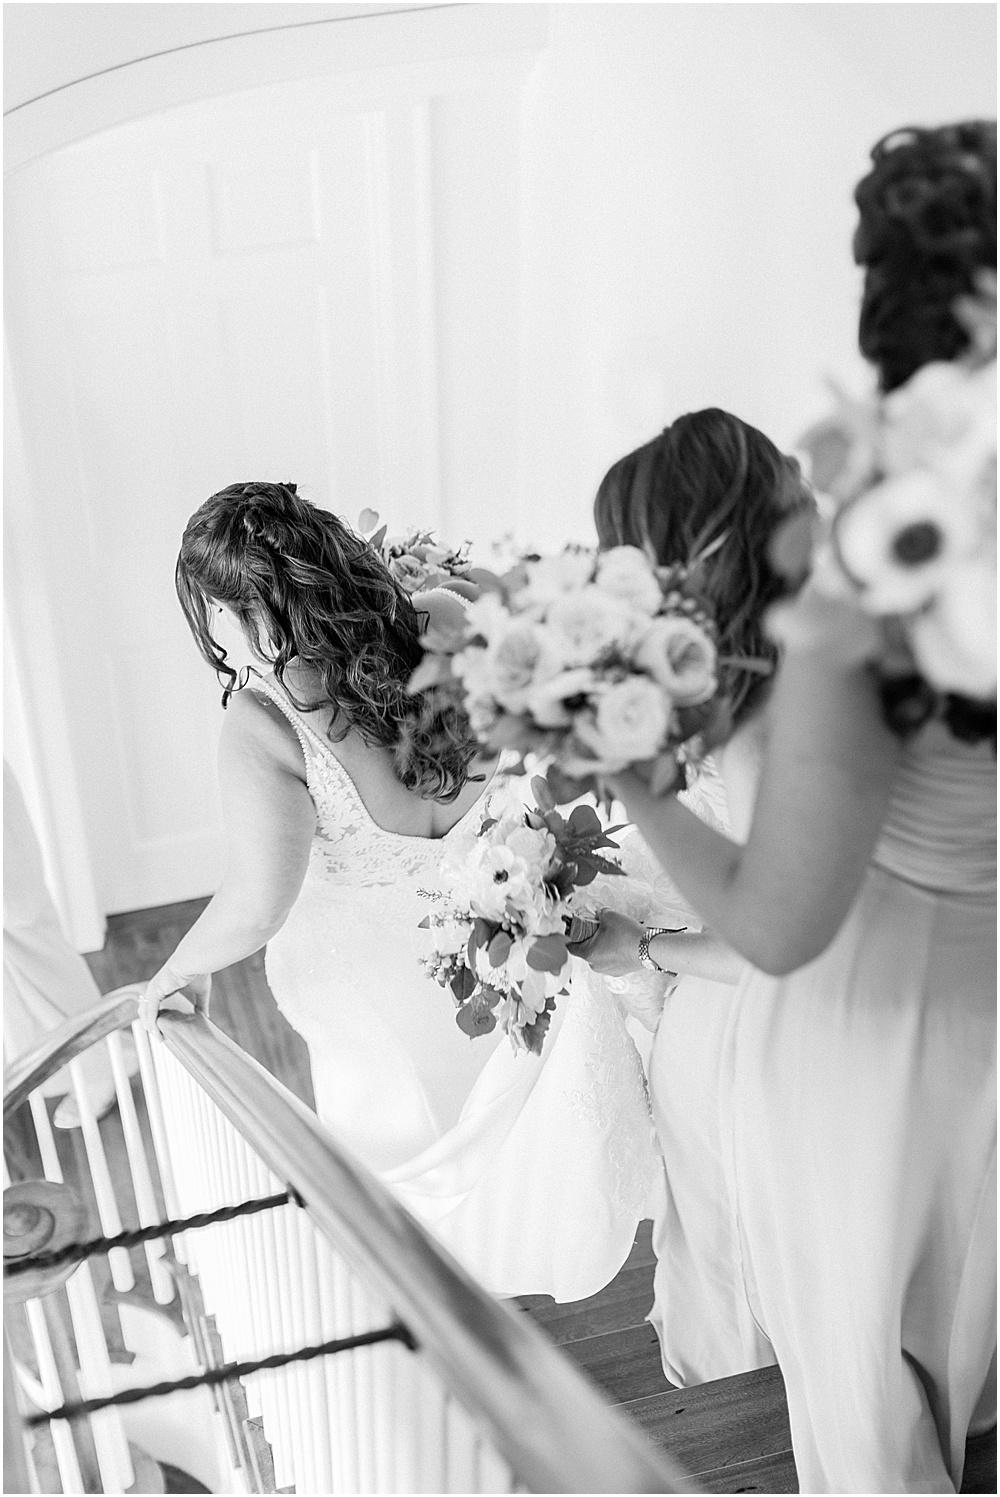 tabor_academy_rebecca_chris_tented_interior_trees_engagement_session_cape_cod_massachusetts_boston_wedding_photographer_meredith_jane_photography_photo_0696.jpg